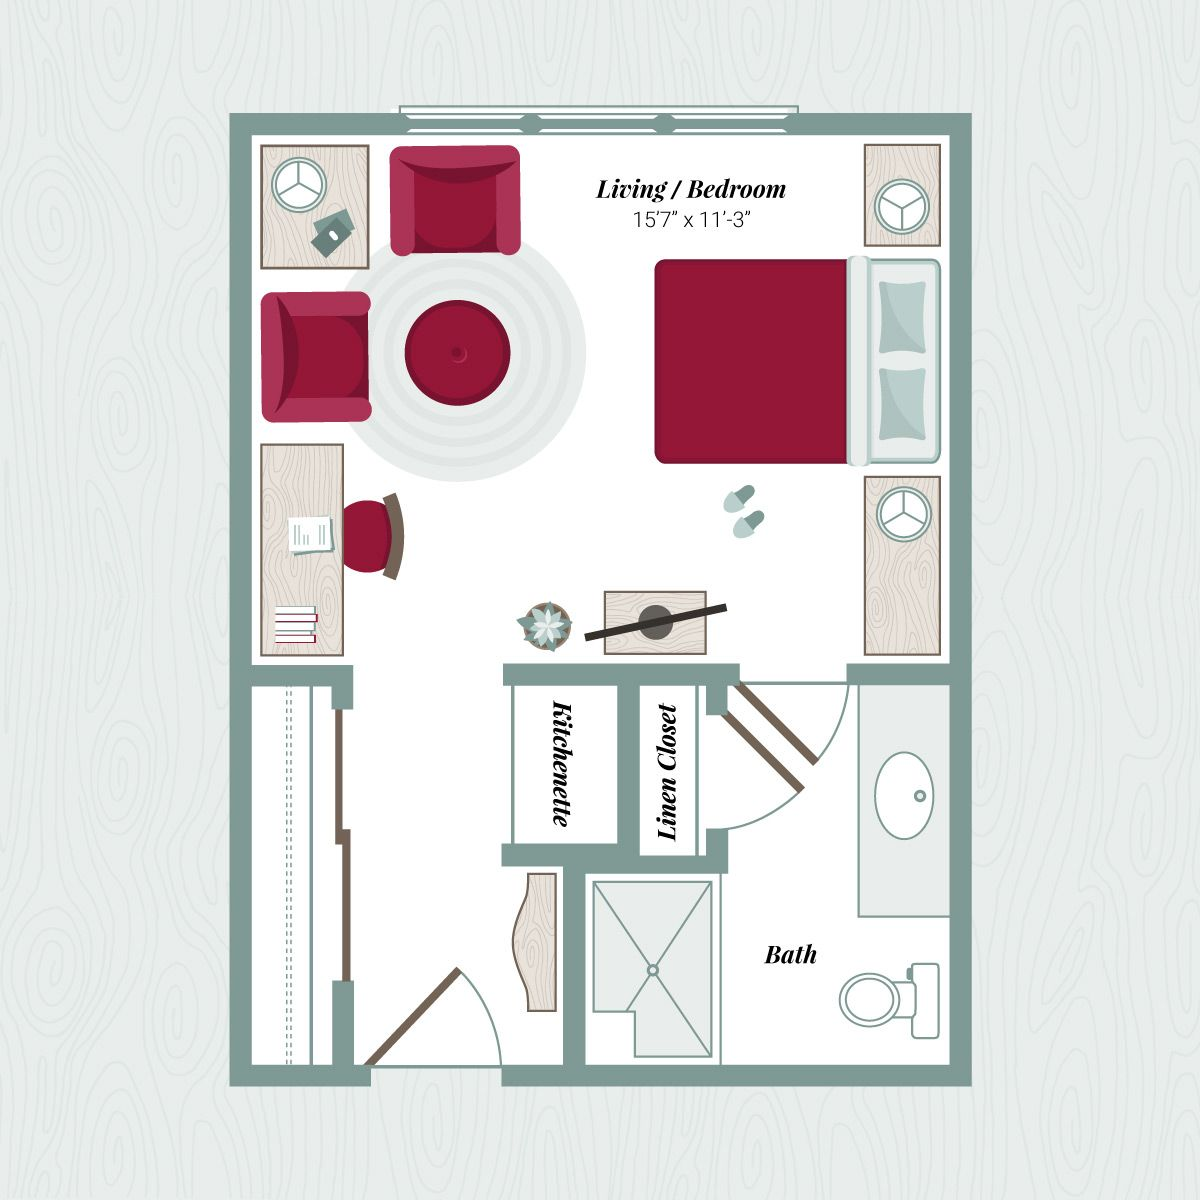 Large Studio Apartments: Floor Plan B - Large Studio Apartment